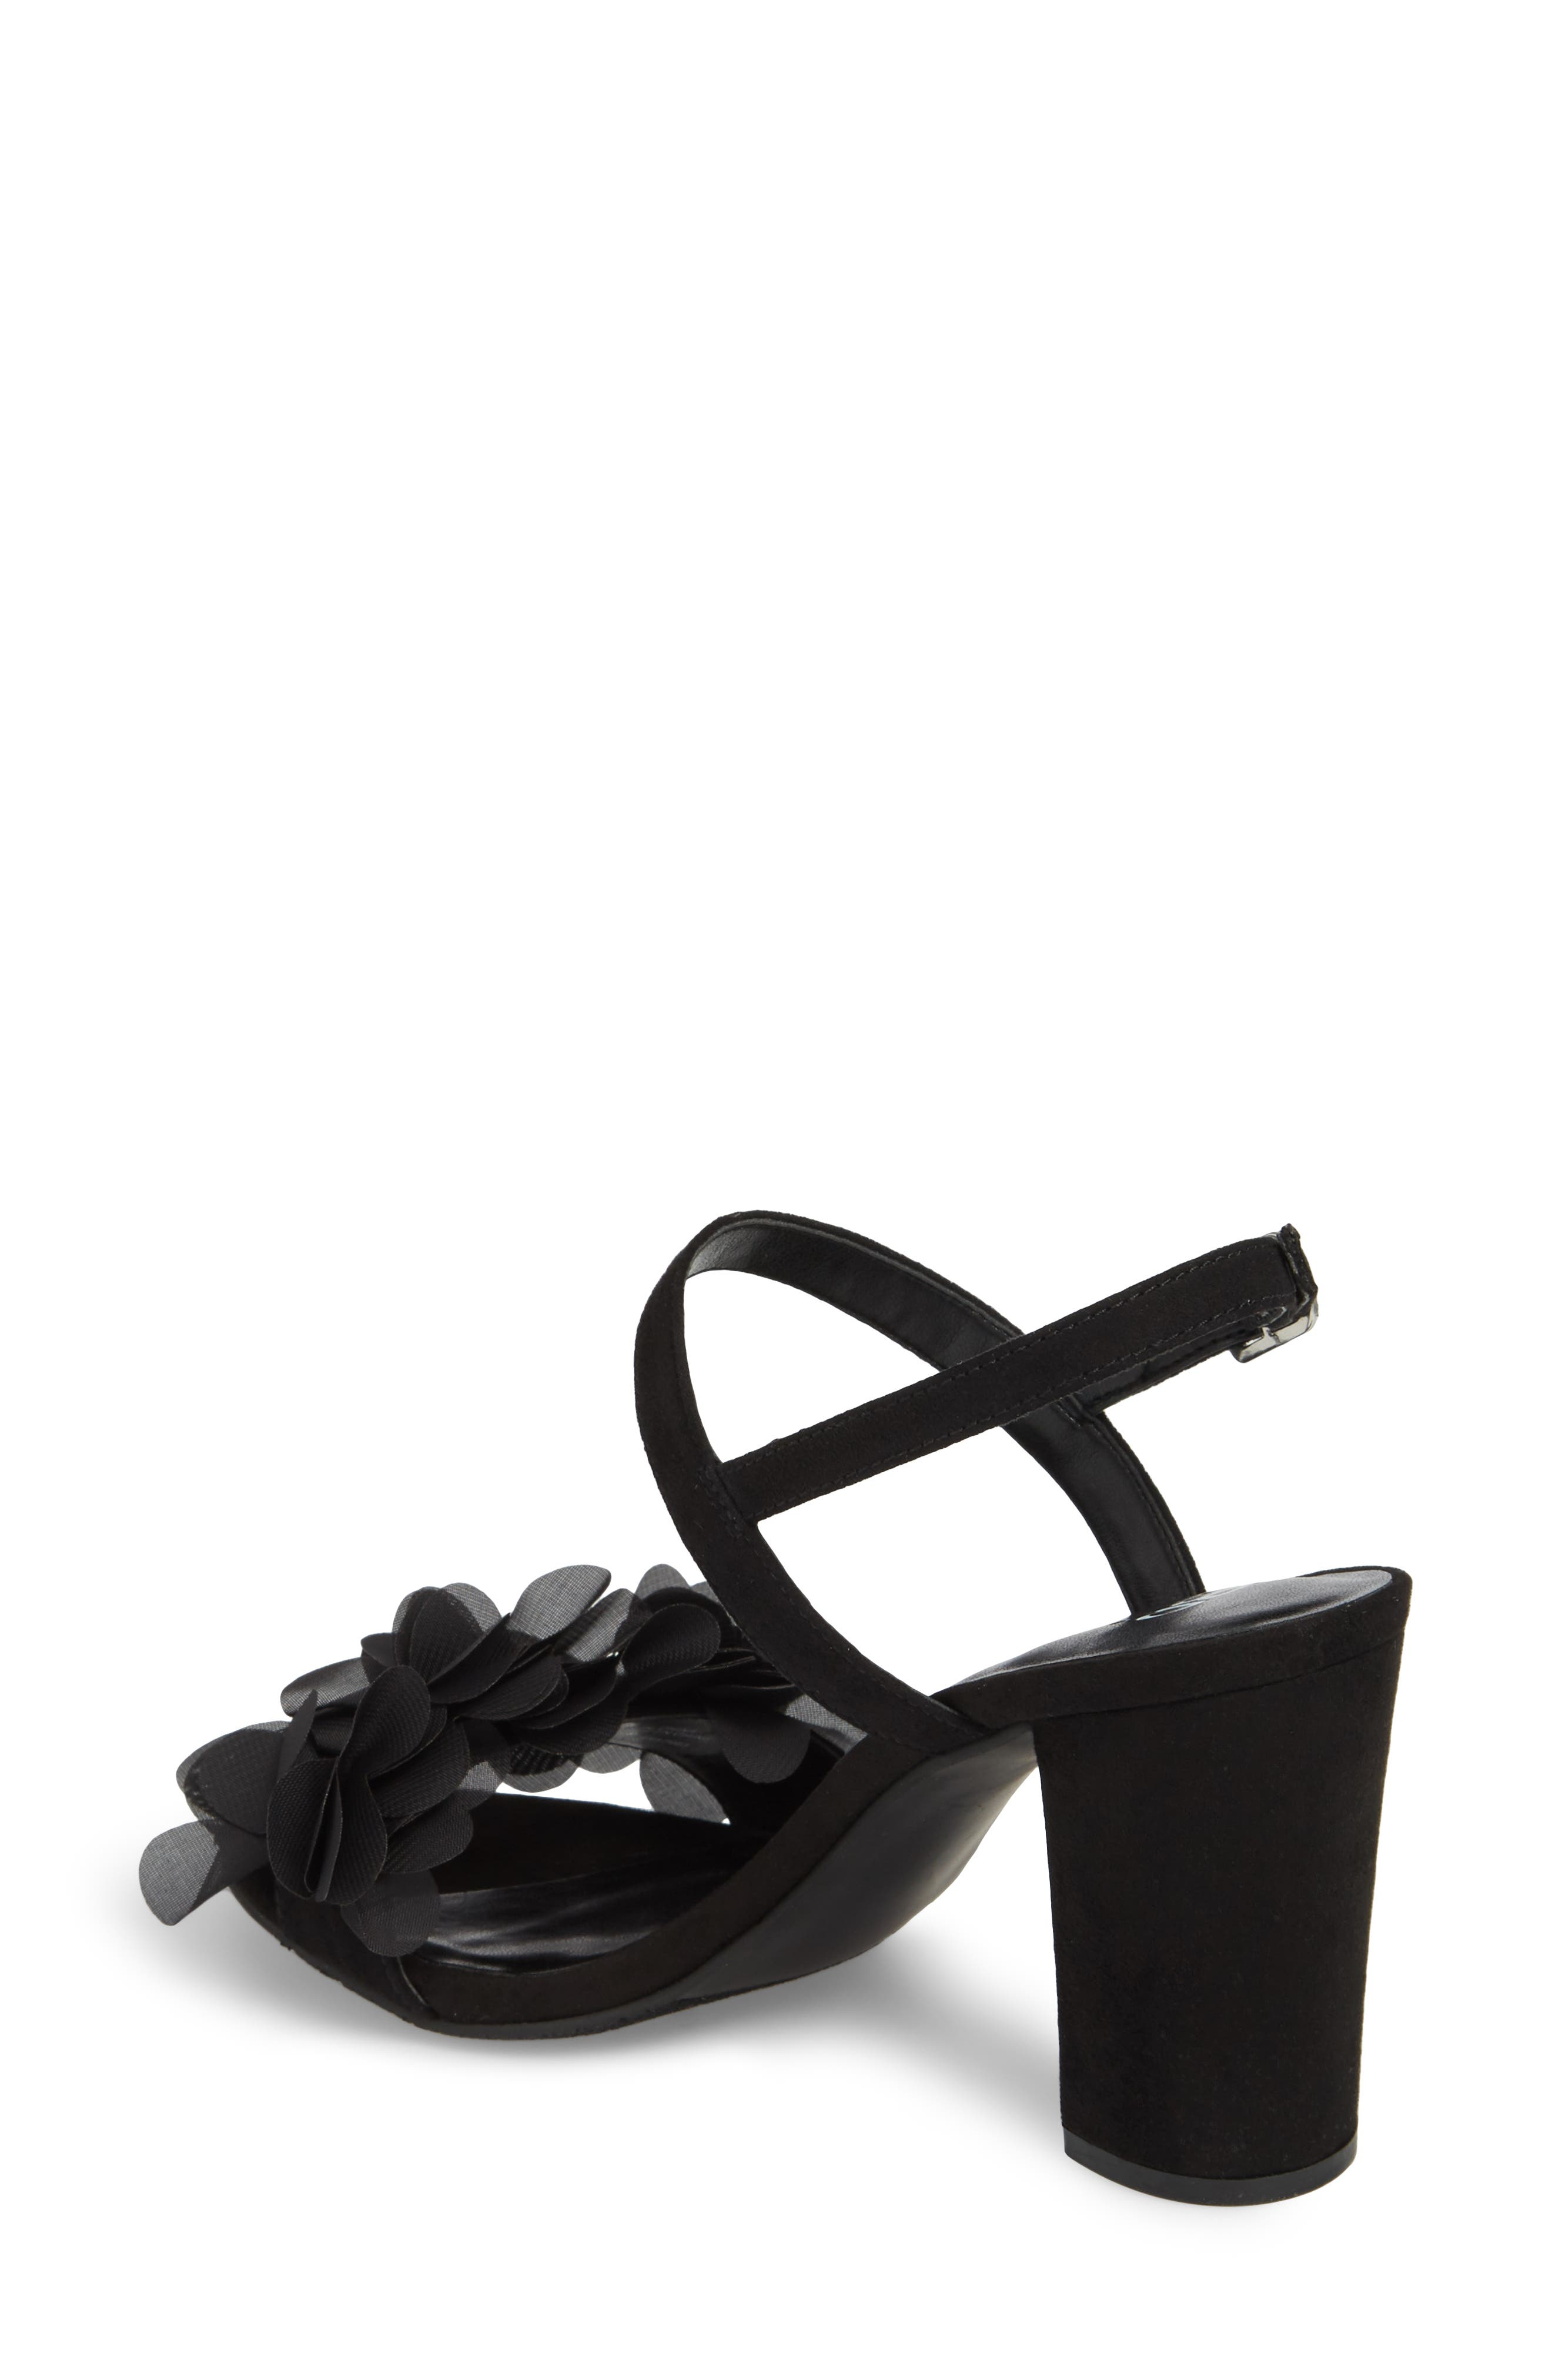 Lula Block Heel Slingback Sandal,                             Alternate thumbnail 2, color,                             BLACK FLOWERS FABRIC